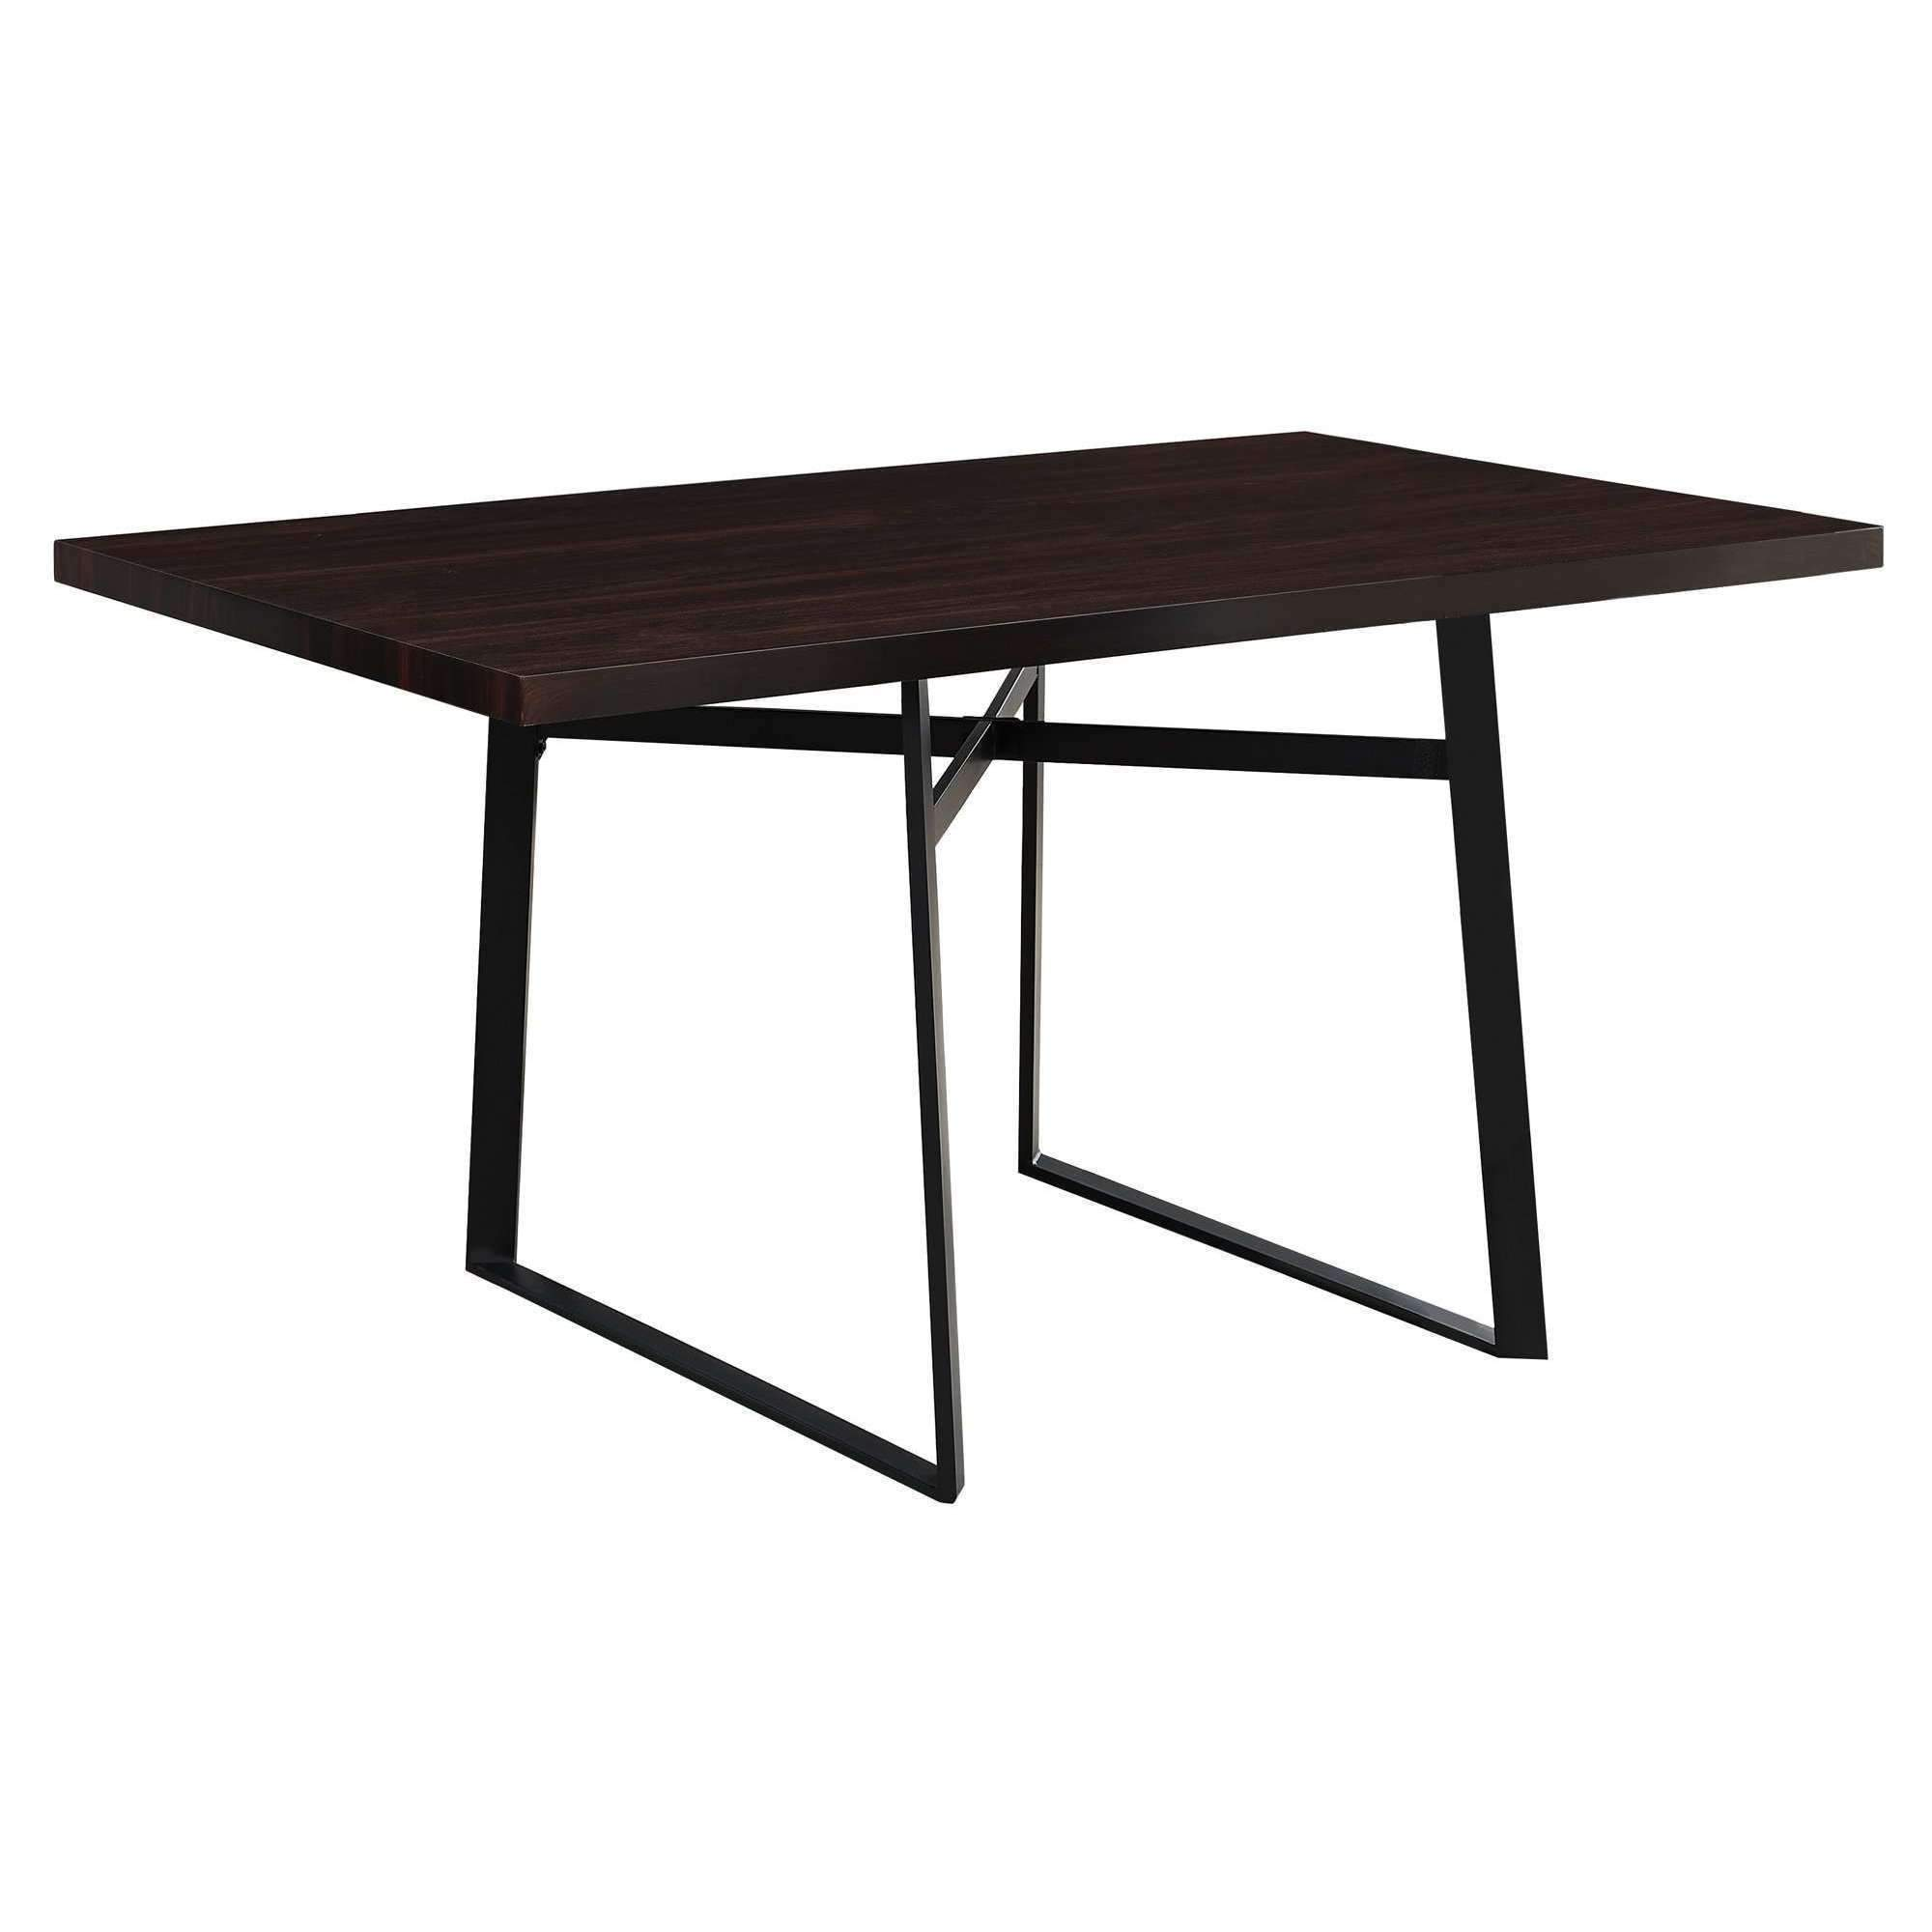 Dining Table 36 X 60 Cappuccino Black Metal Metal Dining